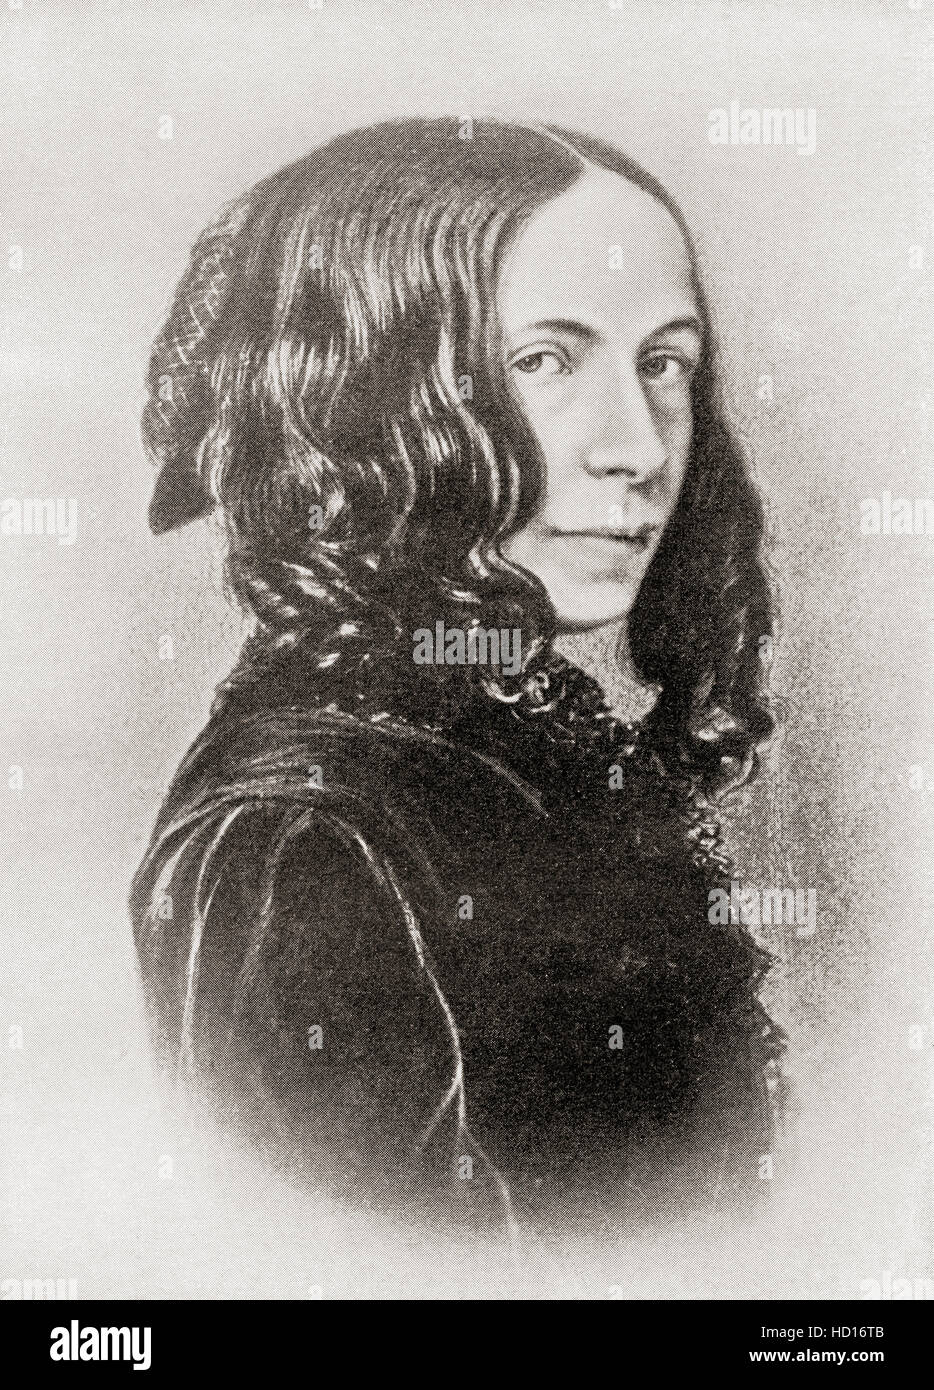 Elizabeth Barrett Browning, née Moulton-Barrett, 1806 – 1861.  English poet. - Stock Image